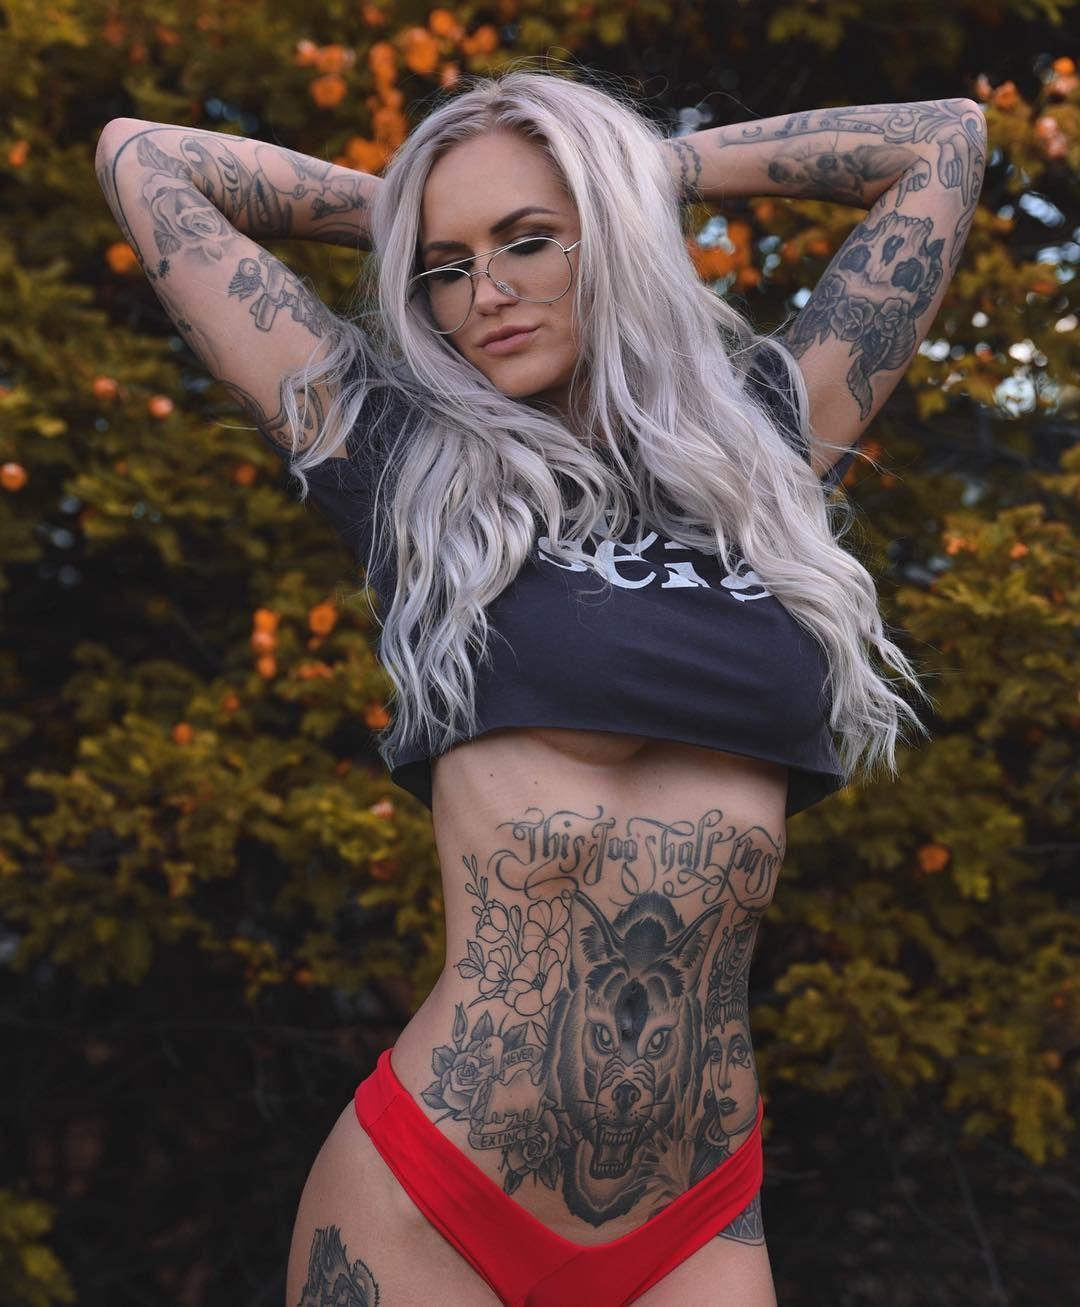 Australian Tattoo Model Shady Brady Tatuaje Fete Fete și Femeie